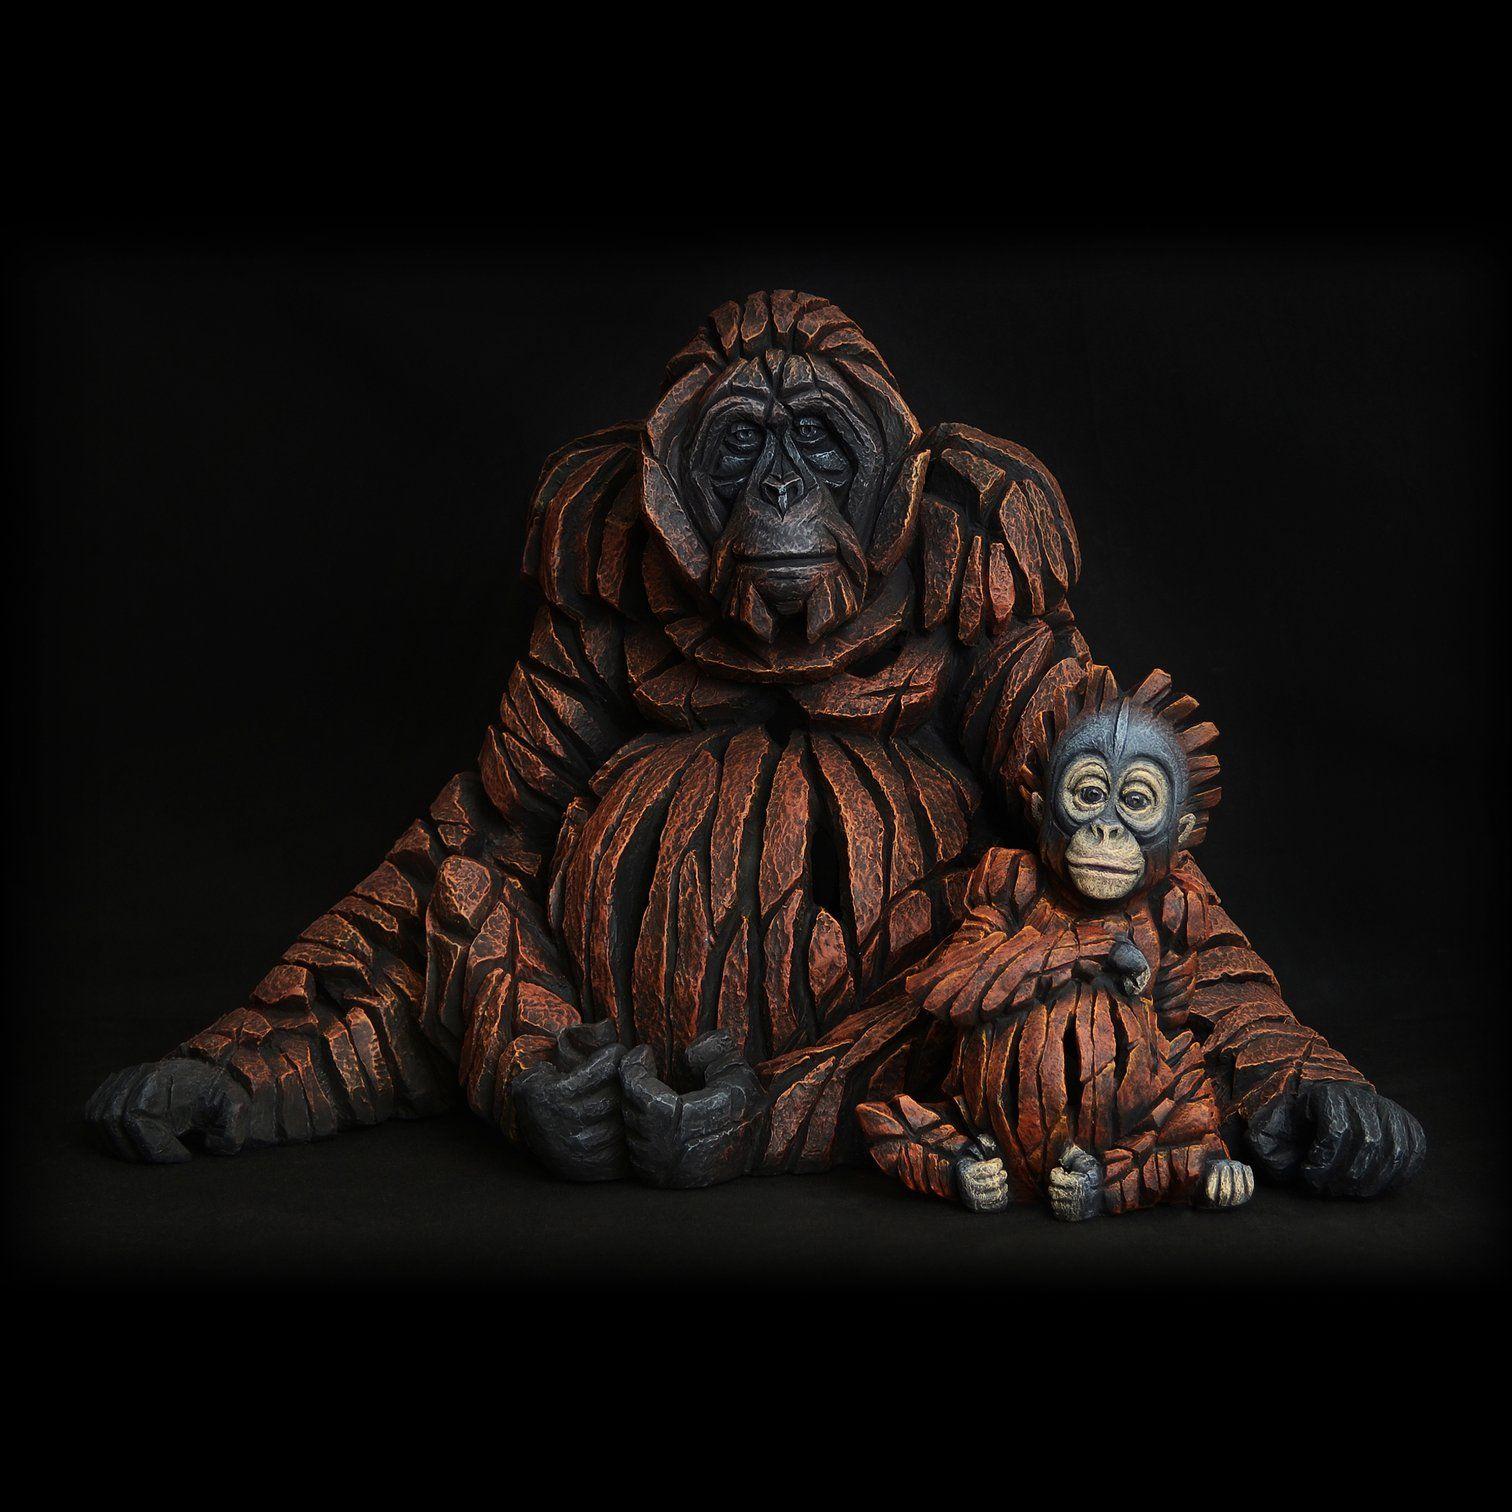 Edge Sculpture Orangutan Figurine